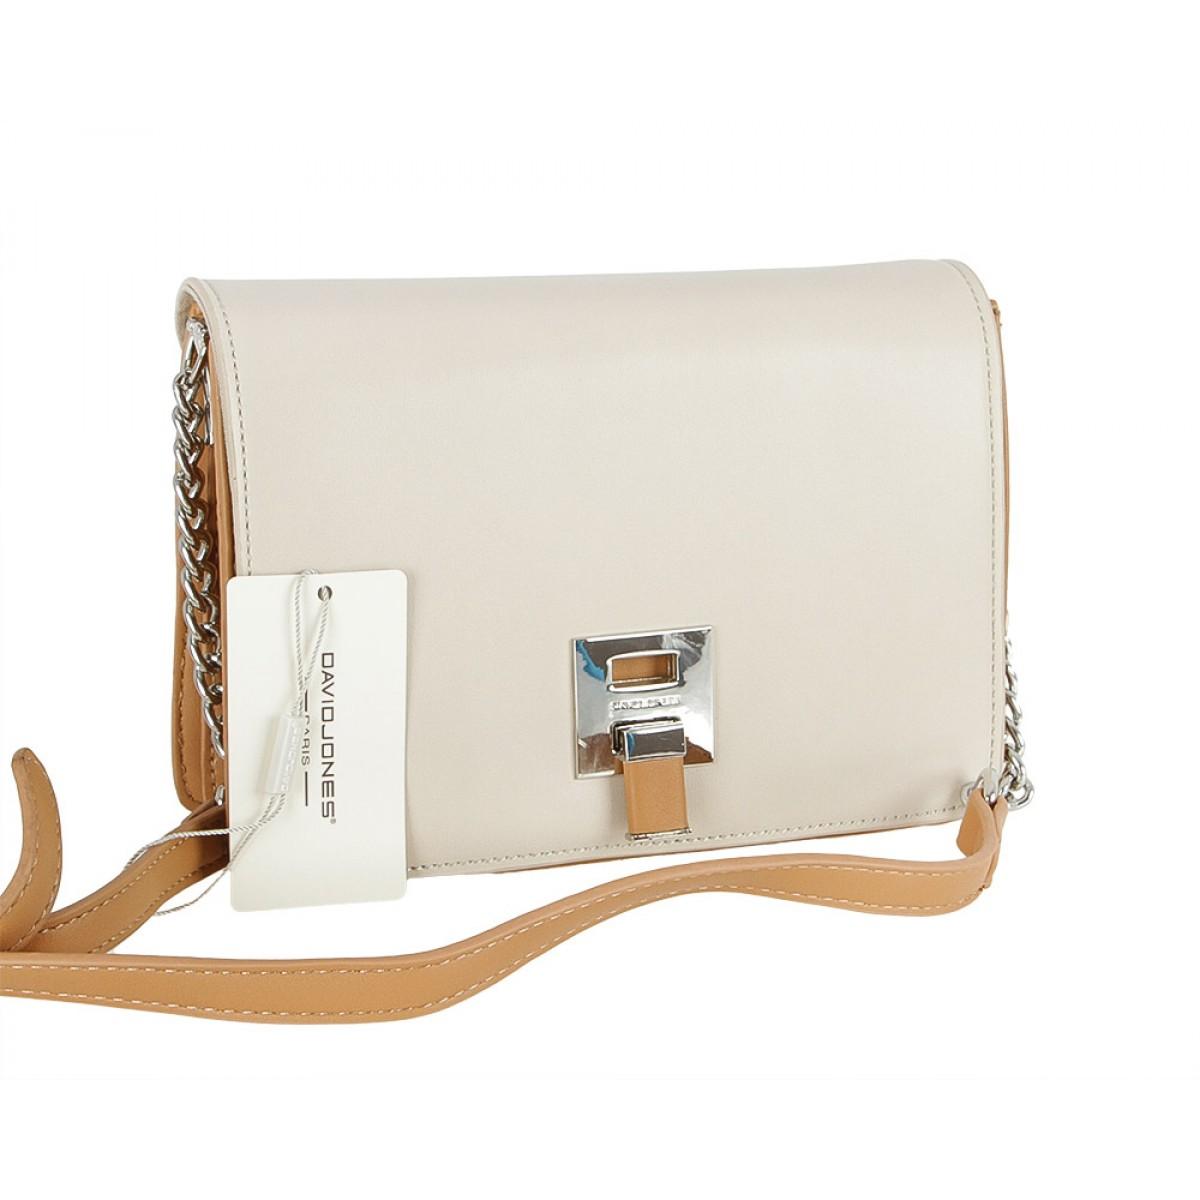 Жіноча сумка David Jones CM5008 BEIGE/CARAMEL